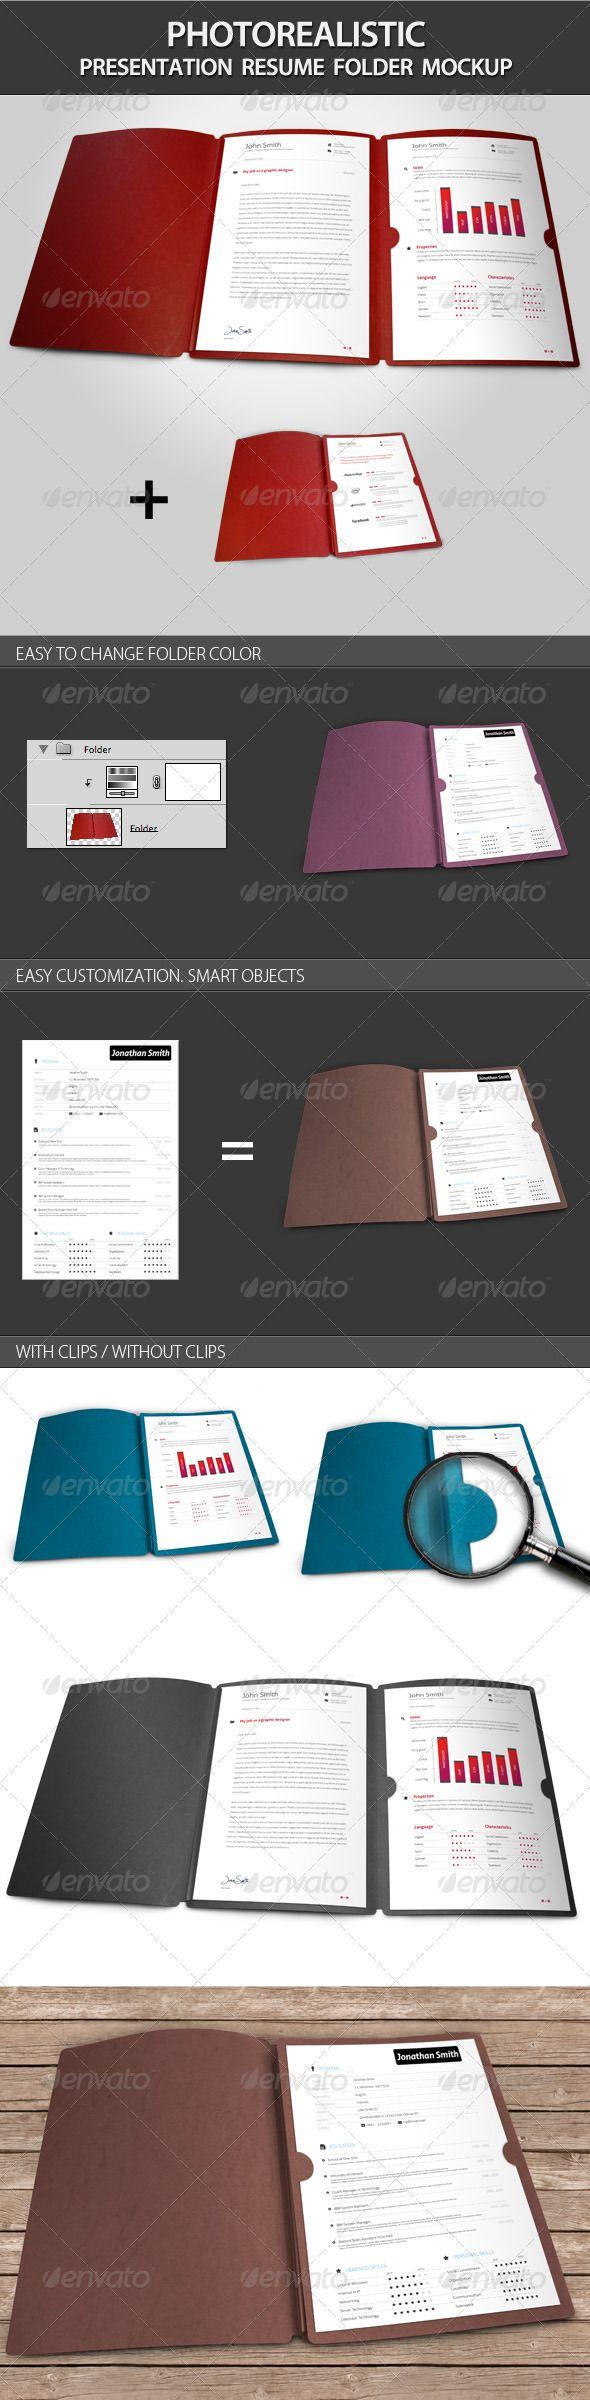 Photorealistic Presentation Resume Folder Mockup  Resume Folders